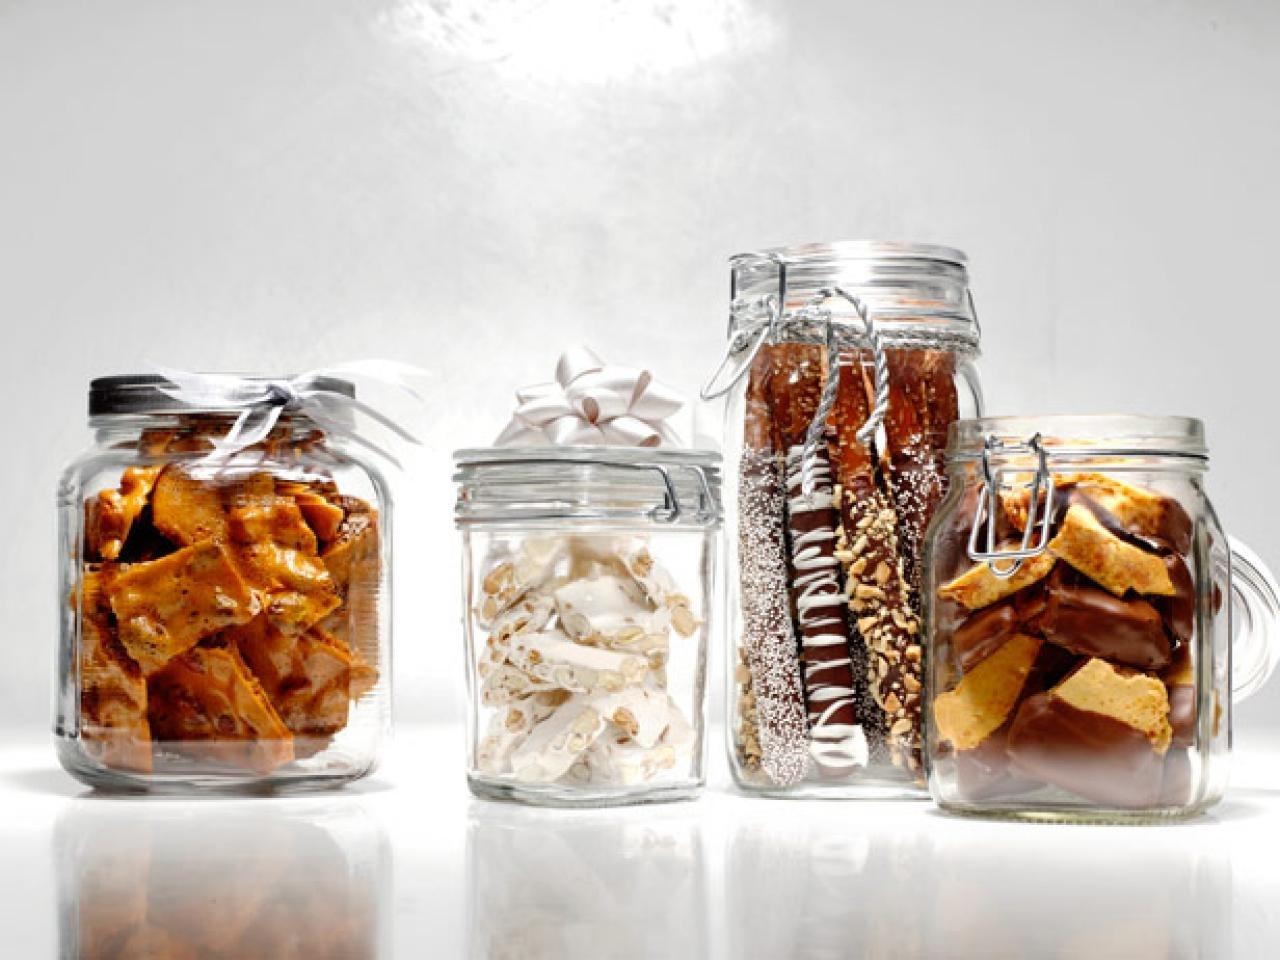 10 Famous Homemade Edible Christmas Gift Ideas %name 2021